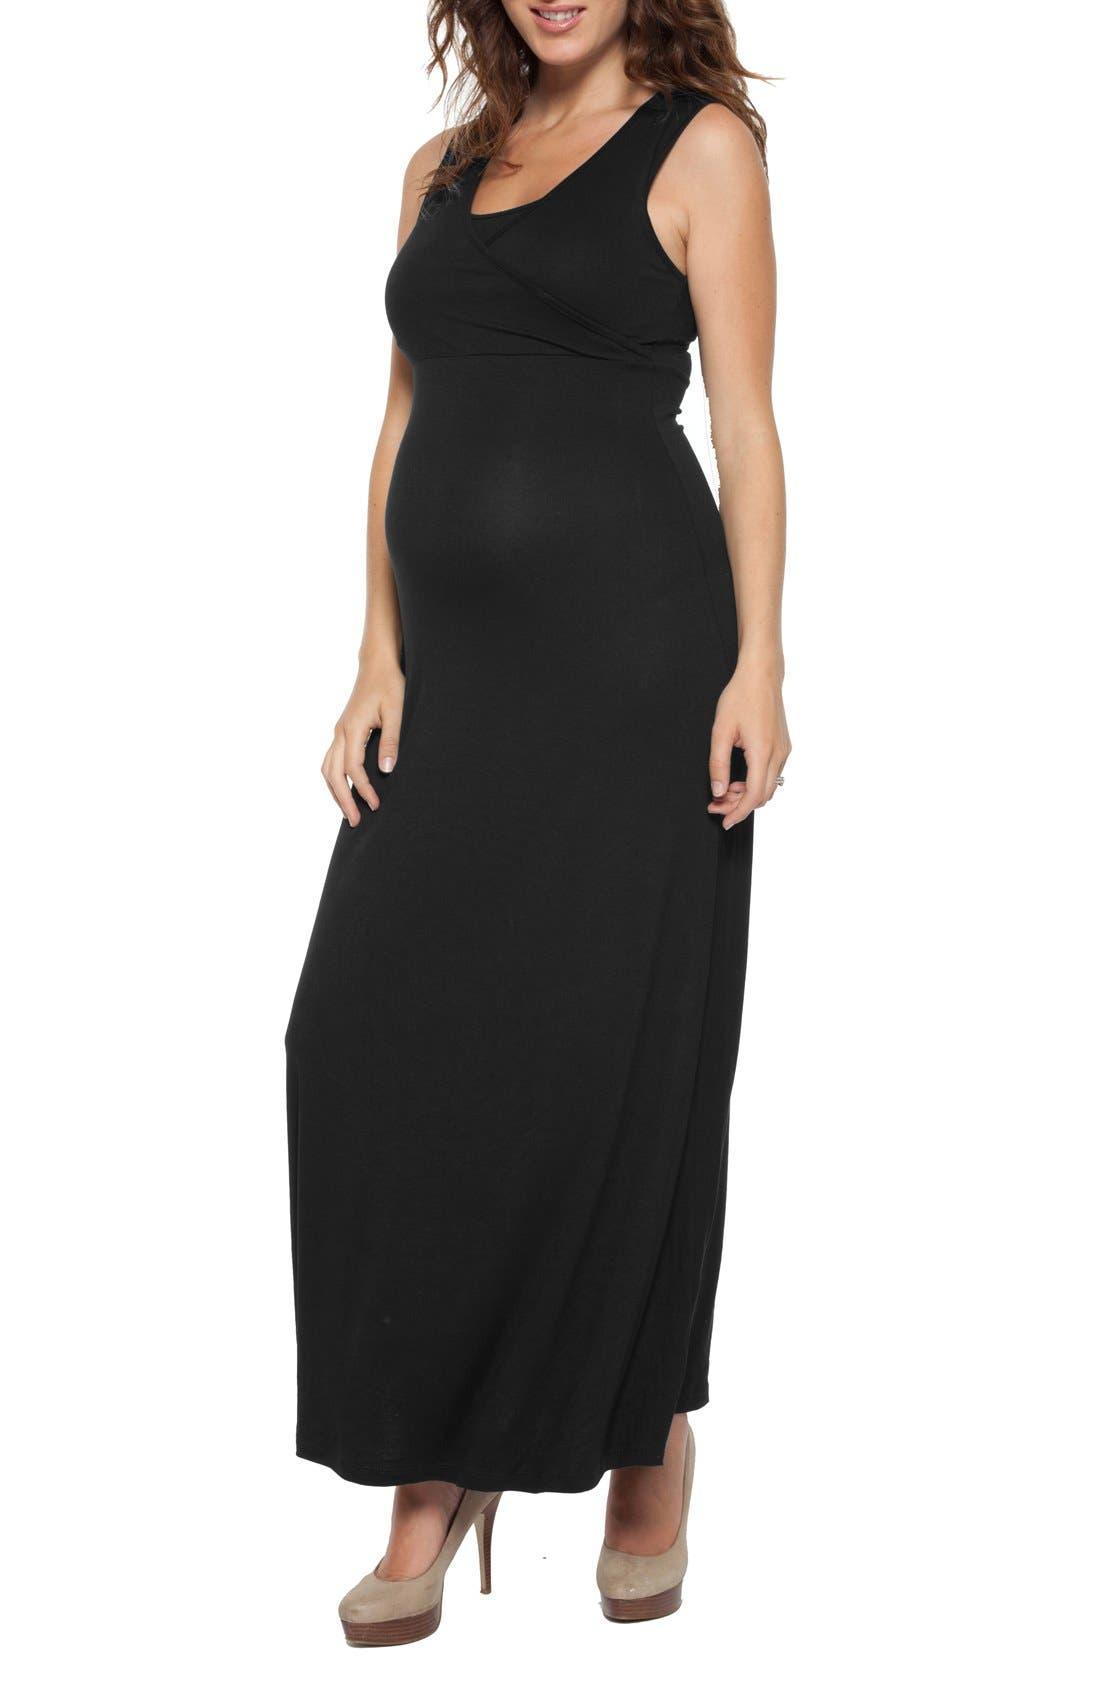 Main Image - Nom Maternity Jersey Maternity/Nursing Dress